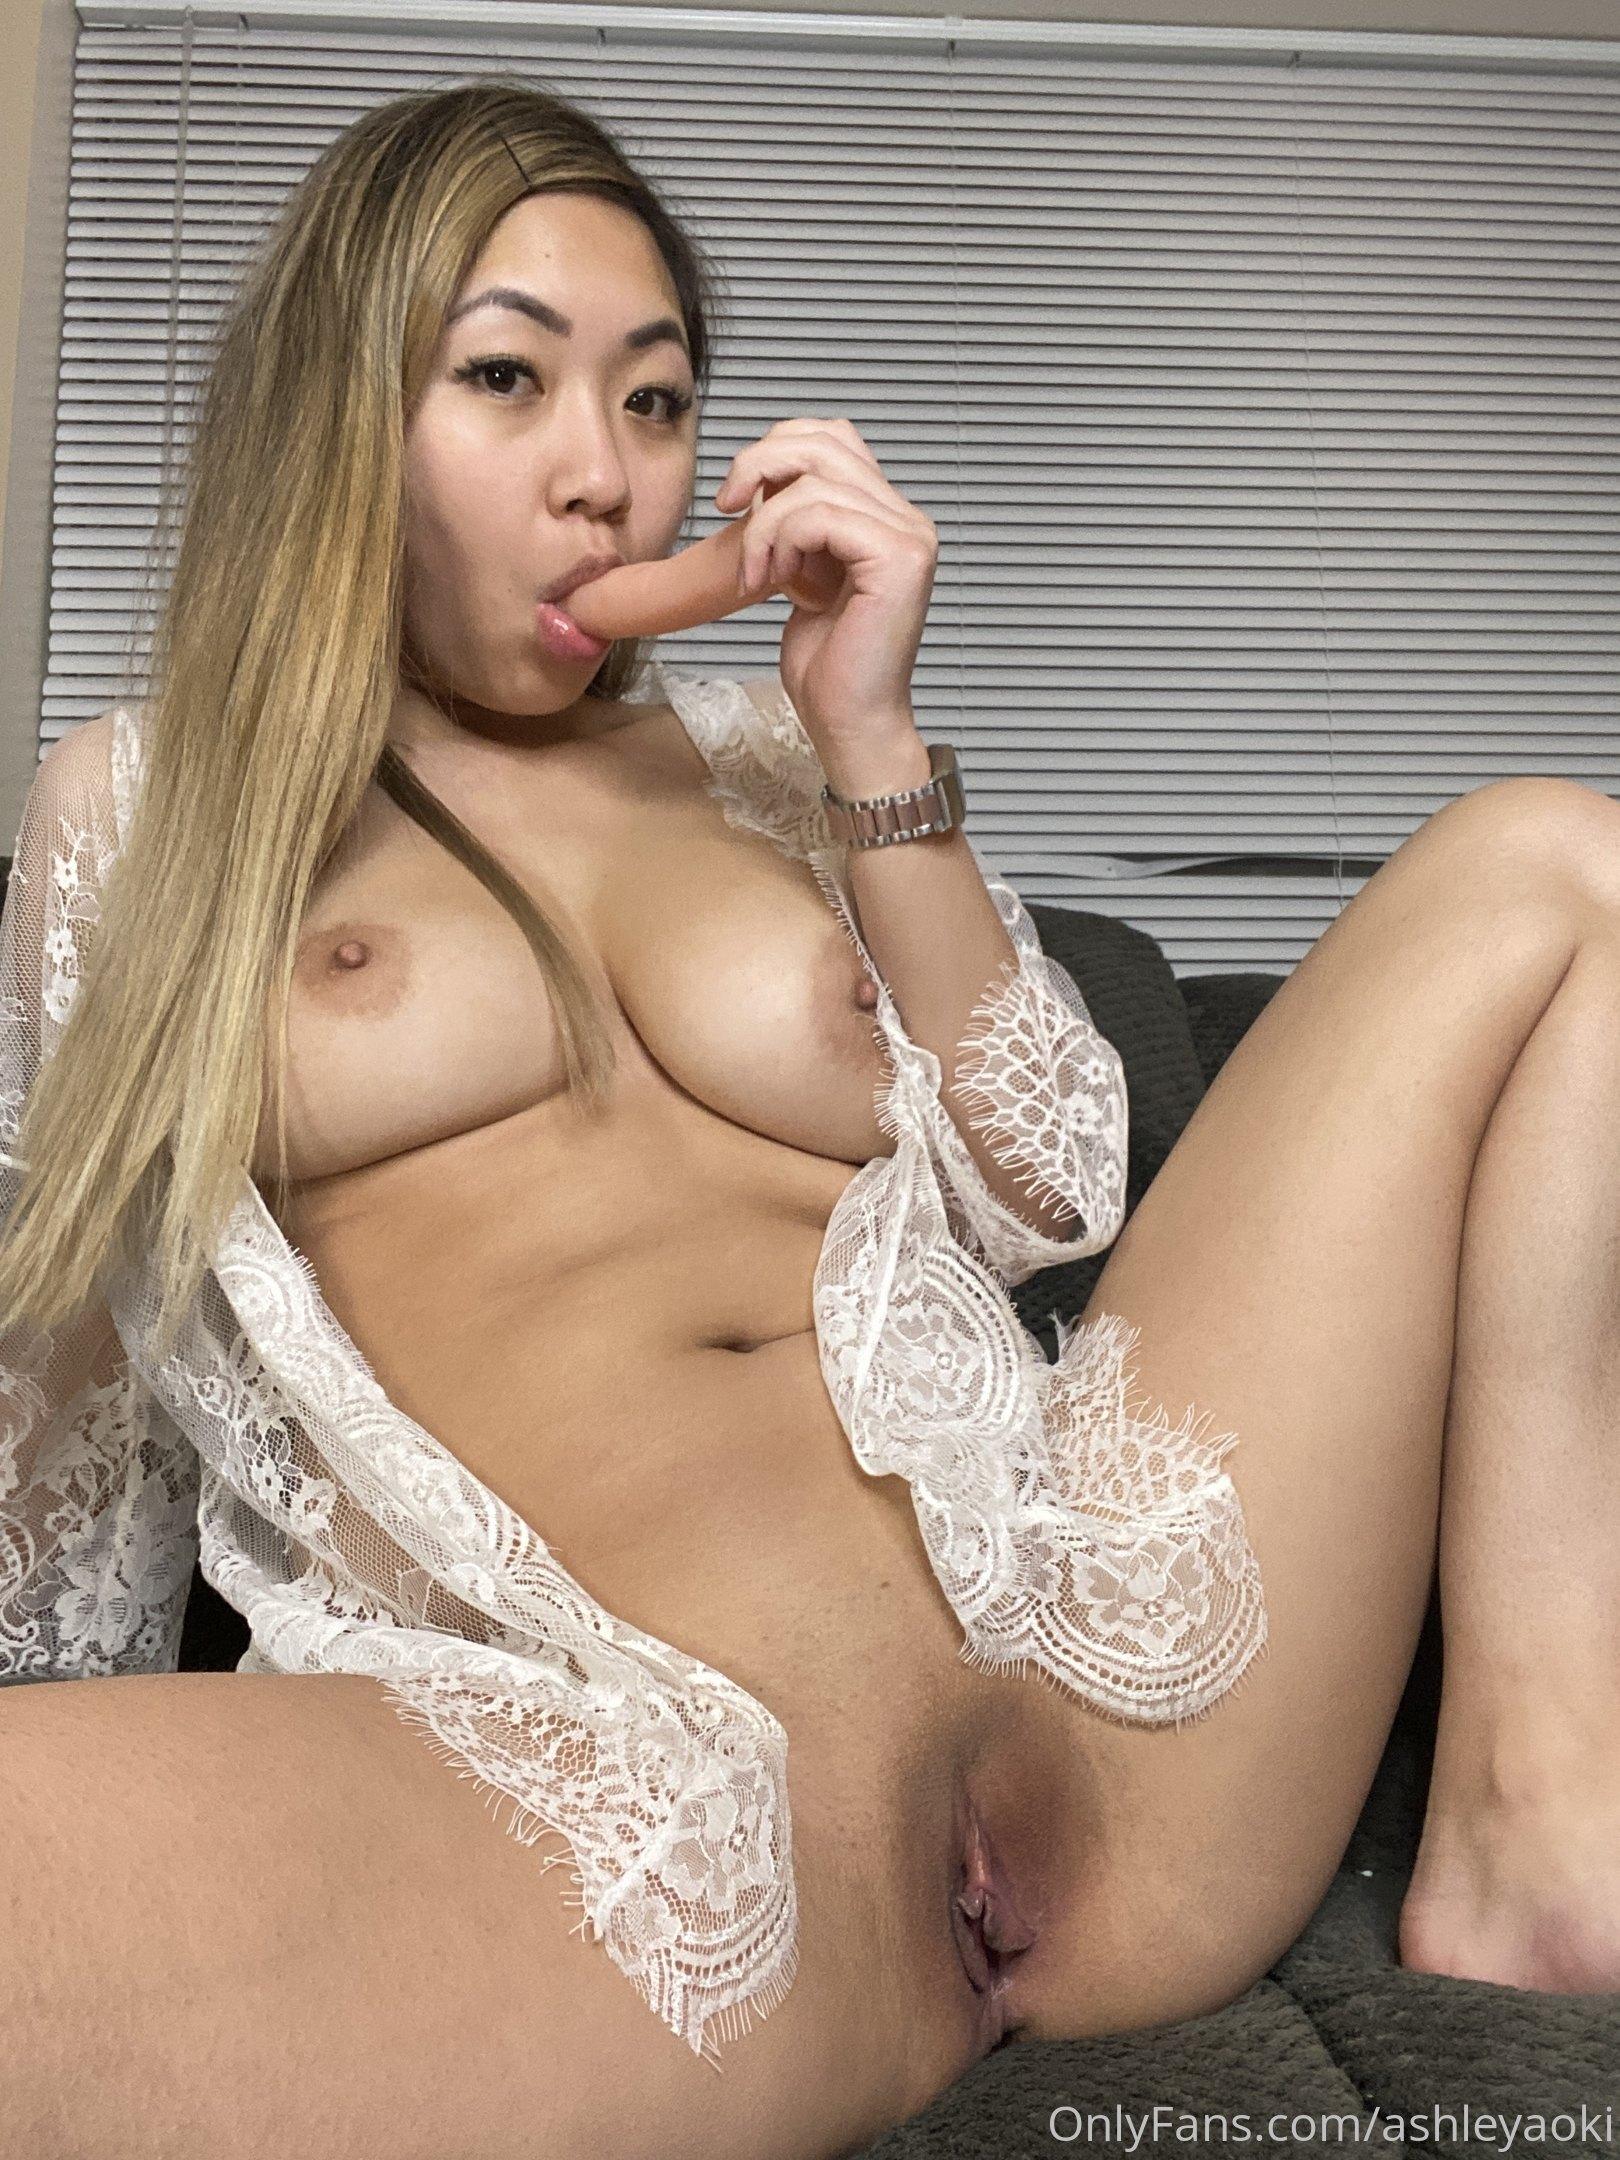 Ashley Aoki, Ashleyaoki, Onlyfans Leaks 0116